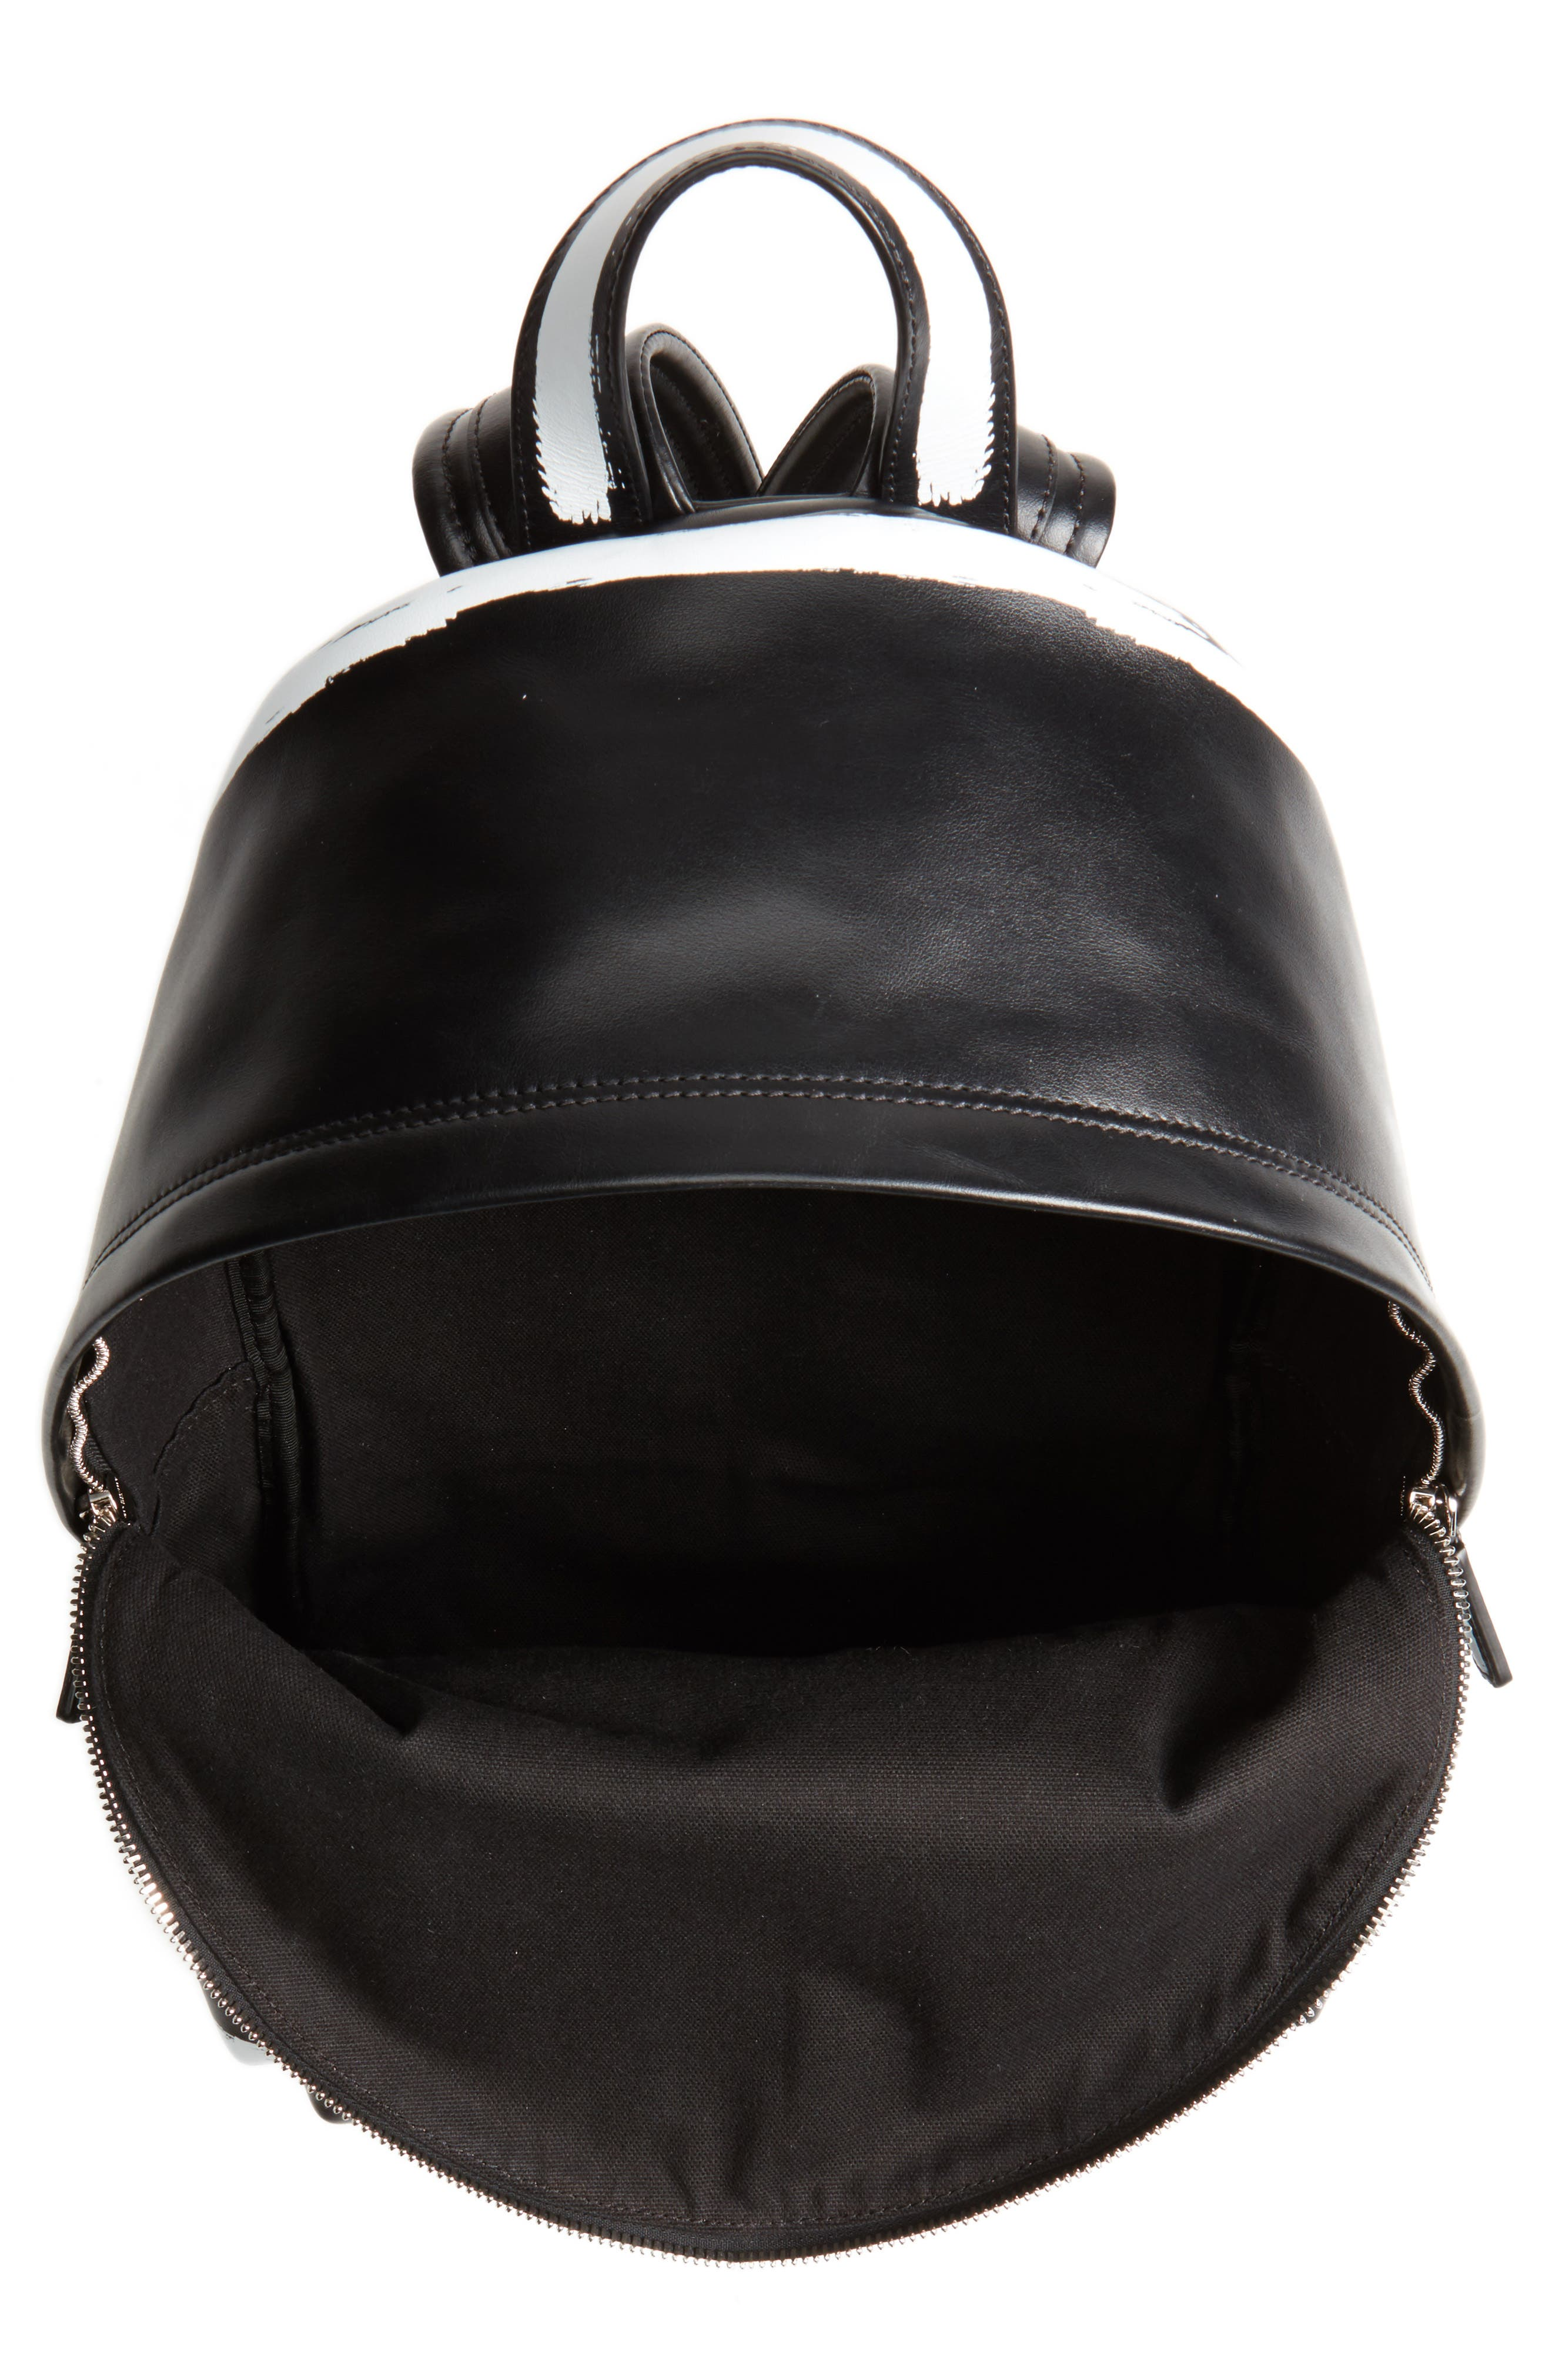 Graffiti Calfskin Leather Backpack,                             Alternate thumbnail 4, color,                             001